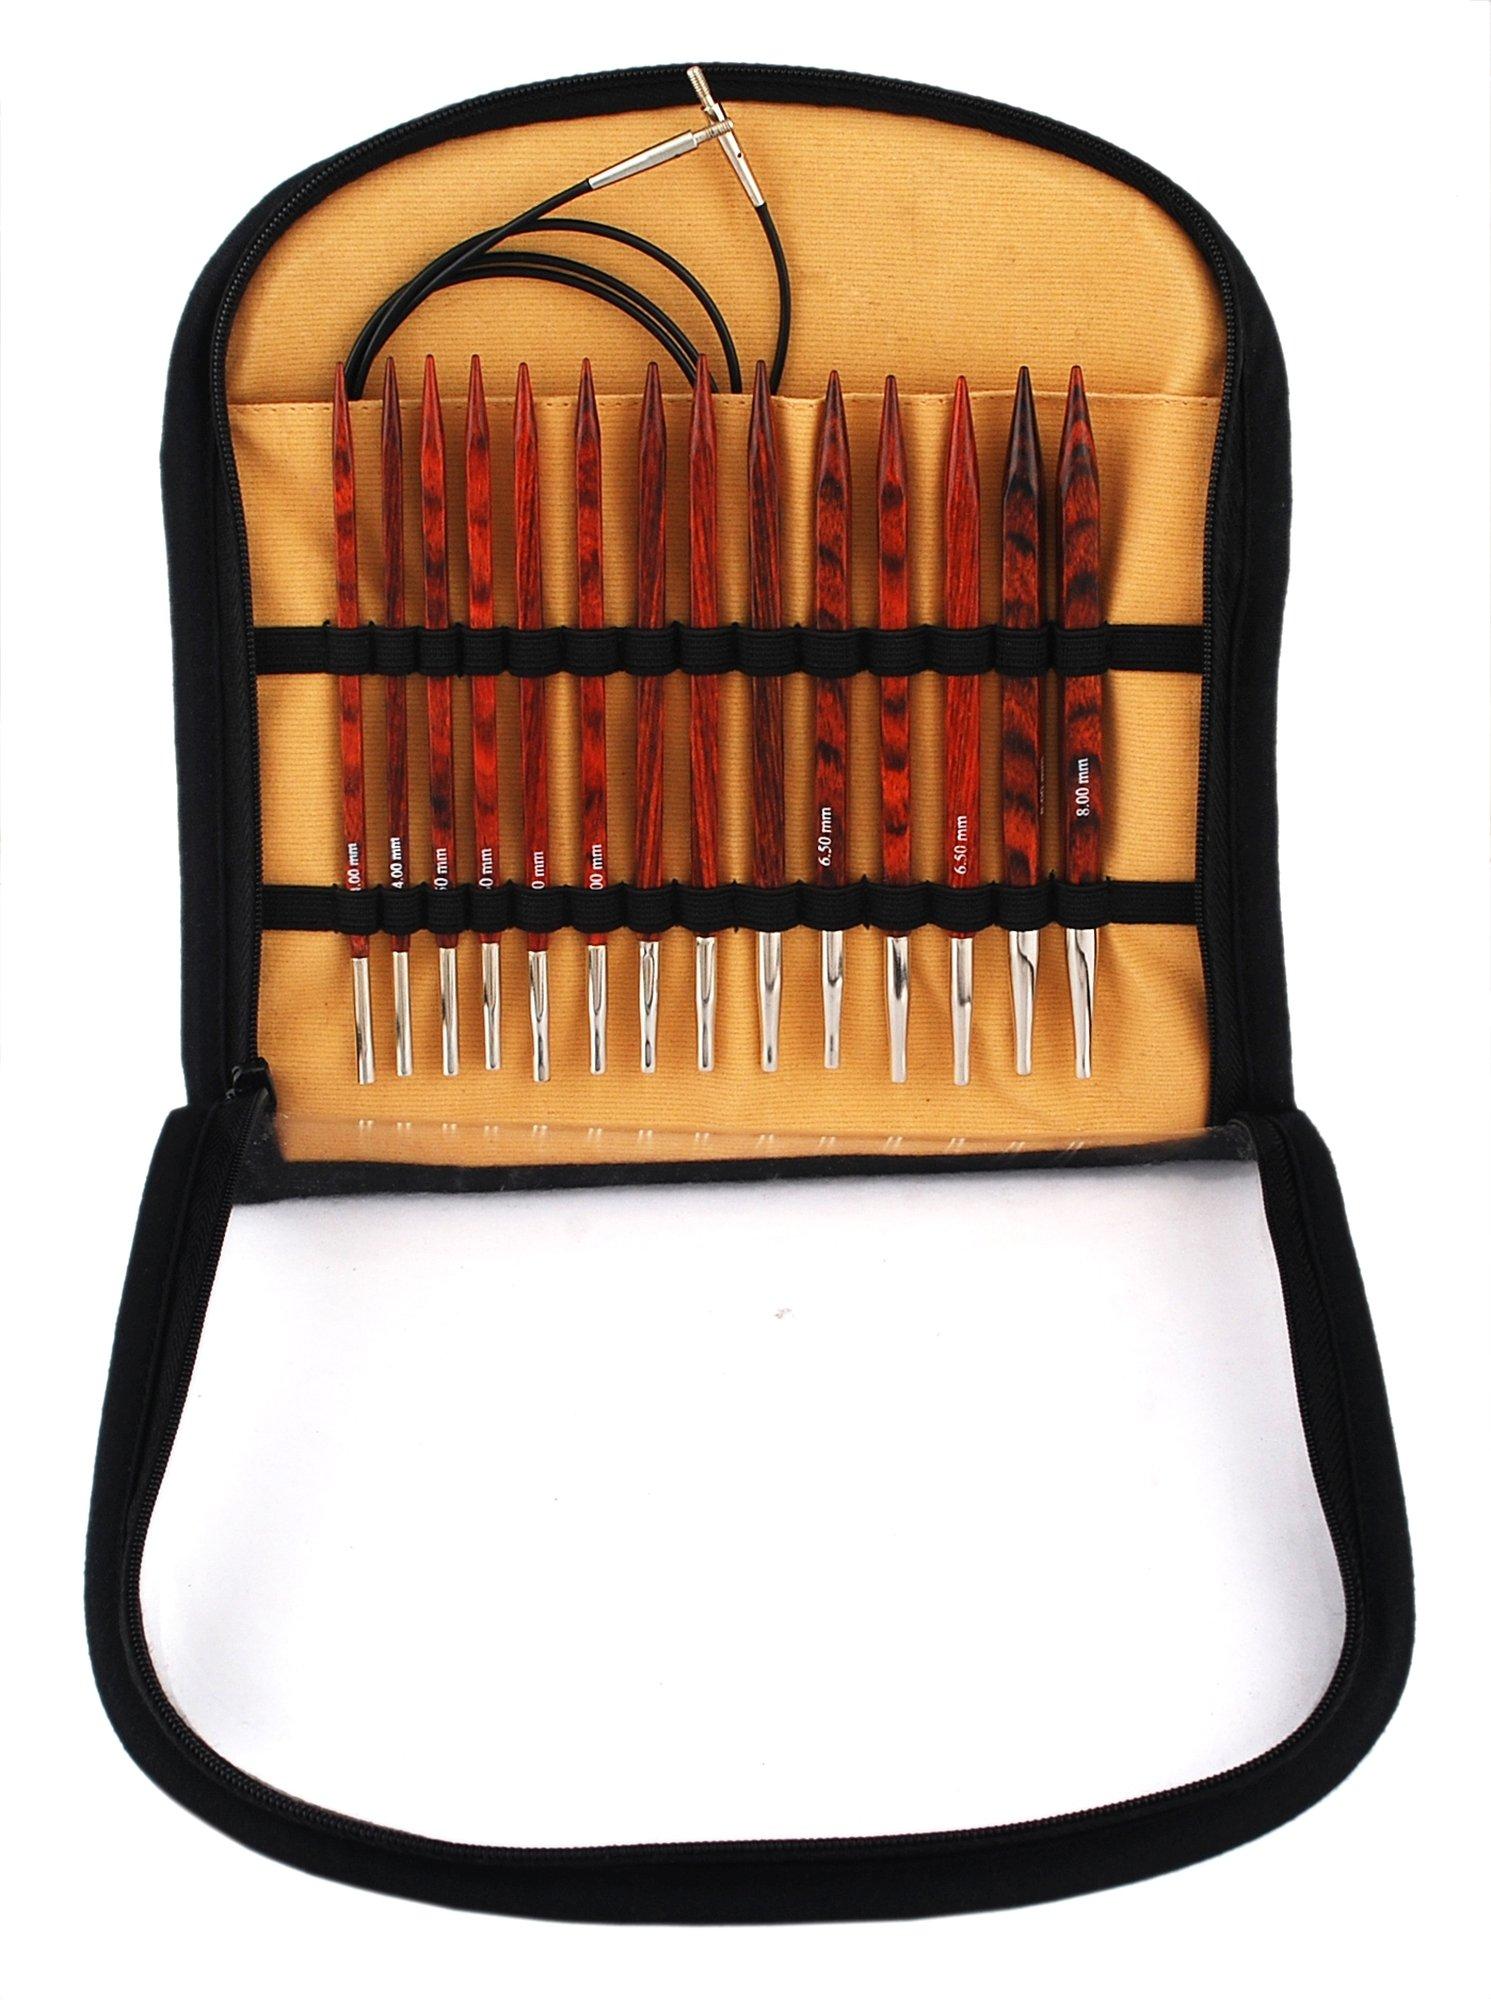 KnitPro - Deluxe - Interchangeable Needle Set - Cubics by Knit Pro (Image #2)